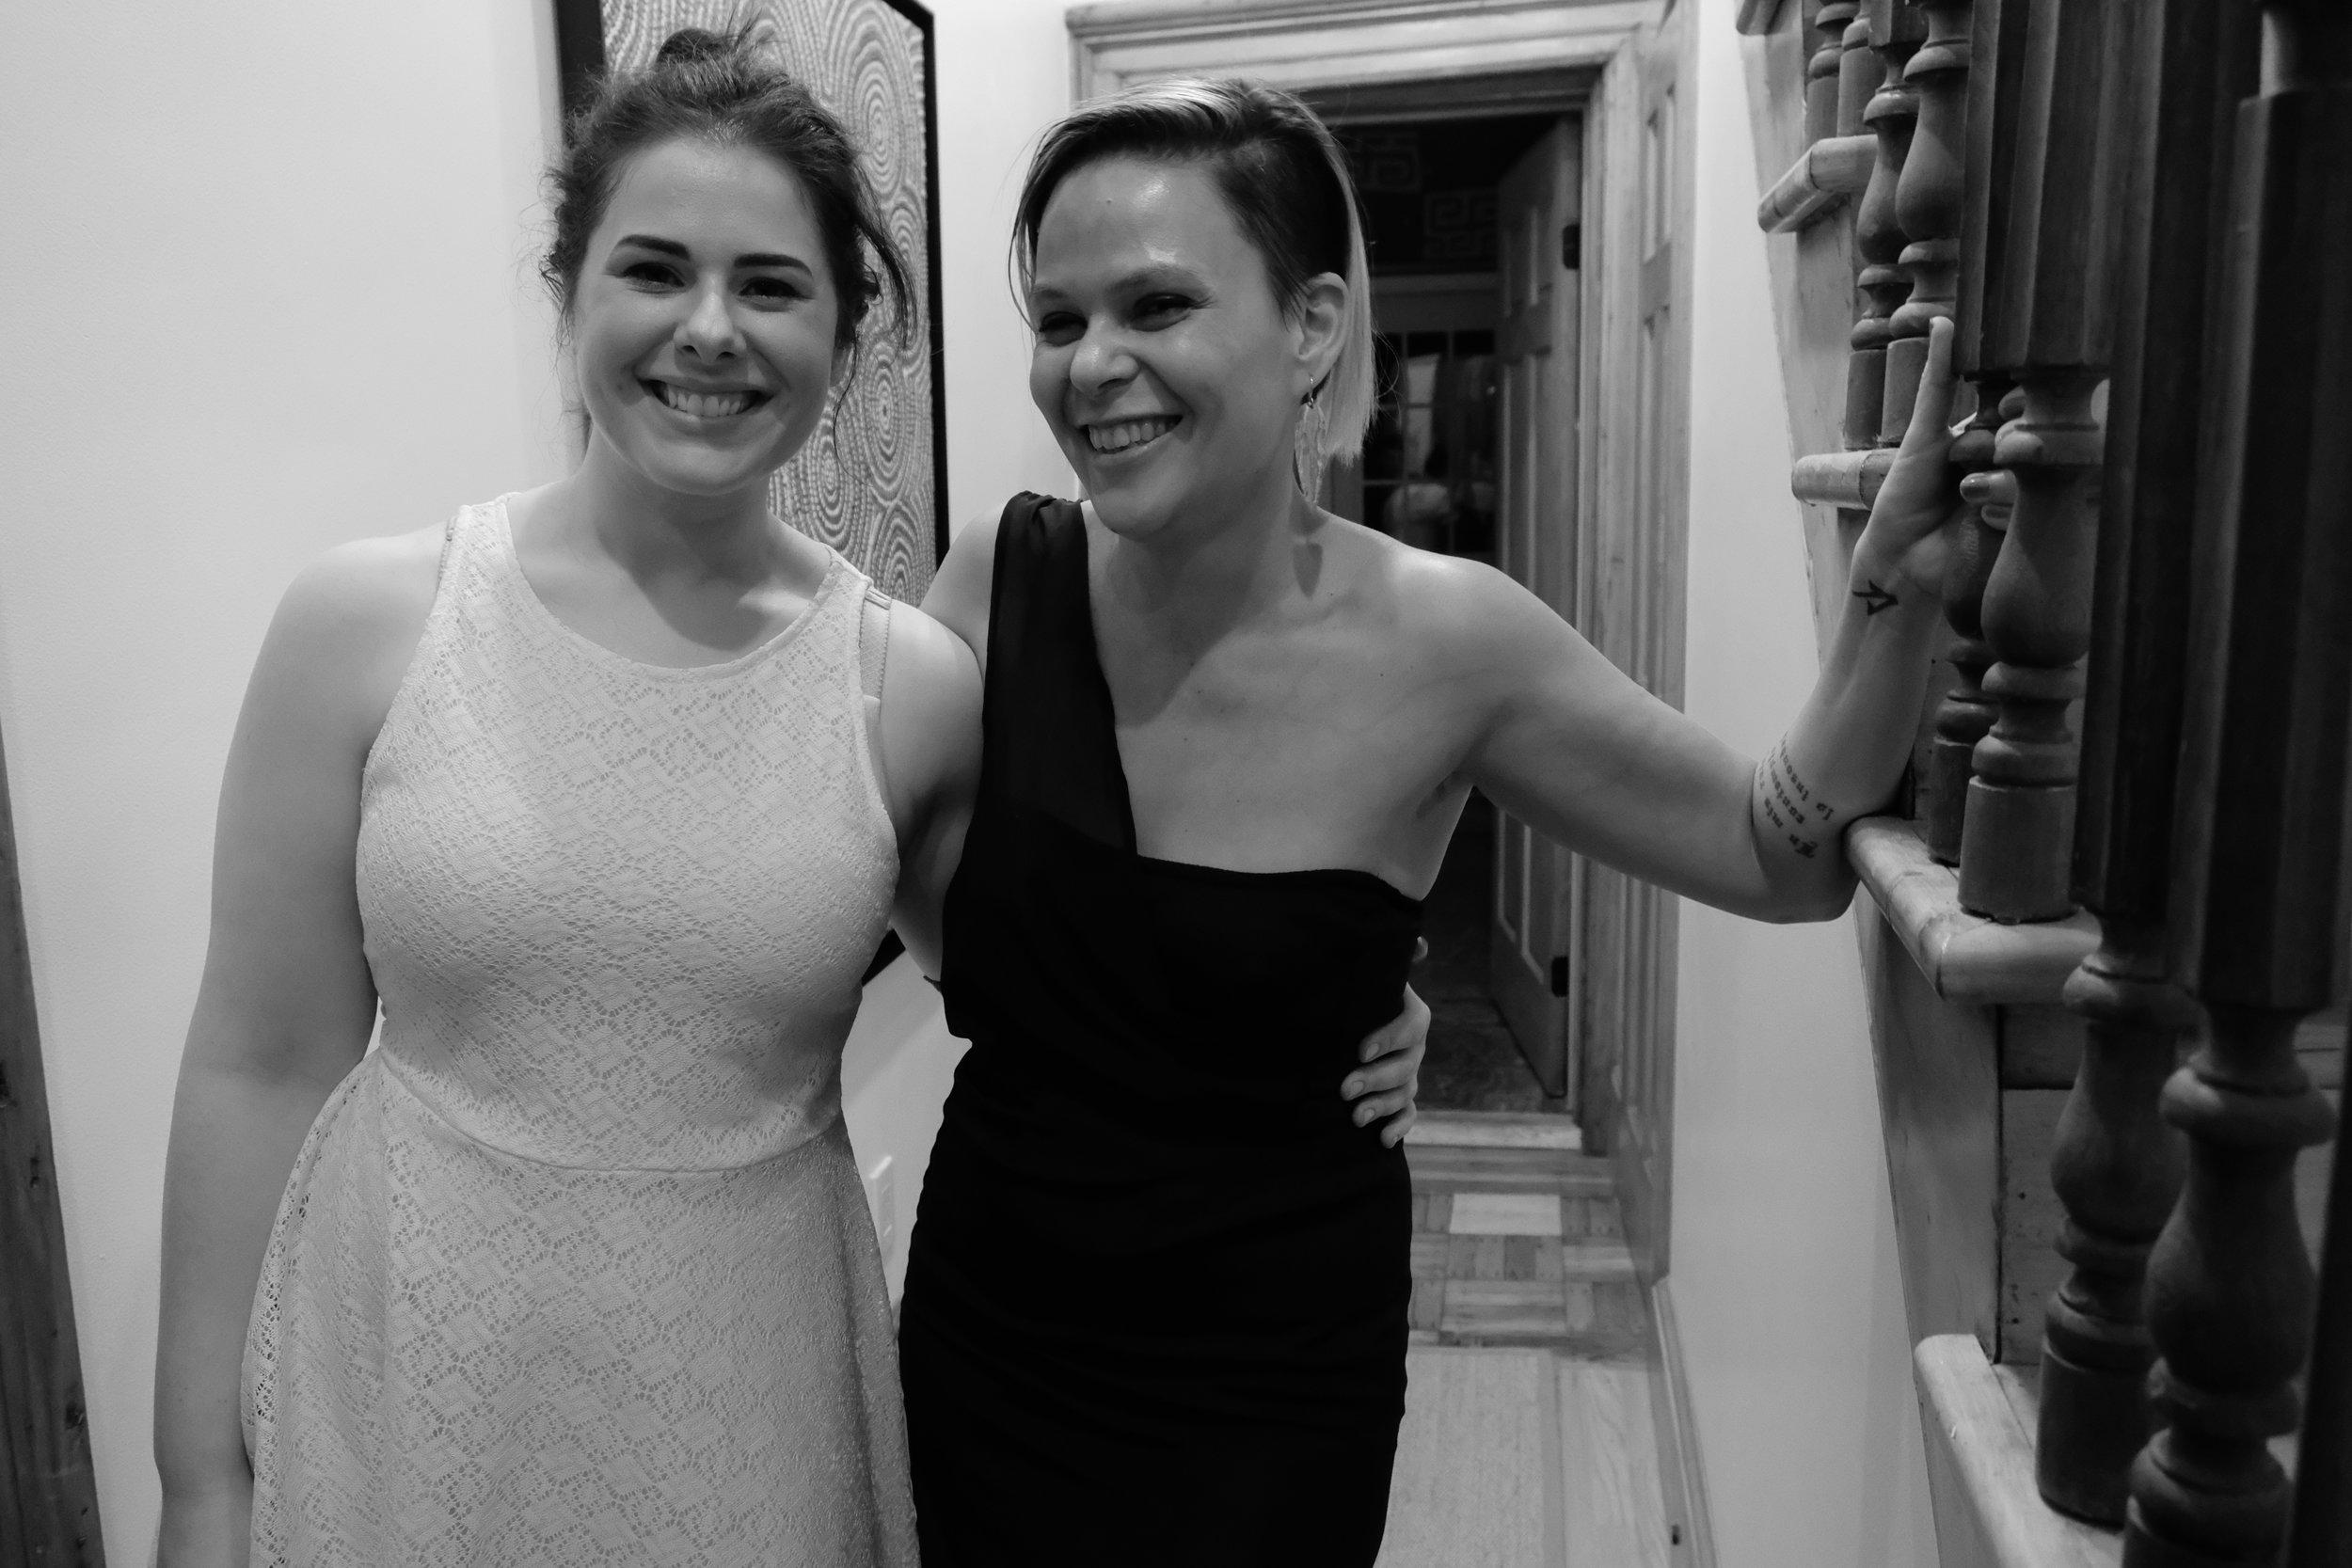 Rachel Hippert & Susan Campos - Fonseca Photo by Julián De La Chica